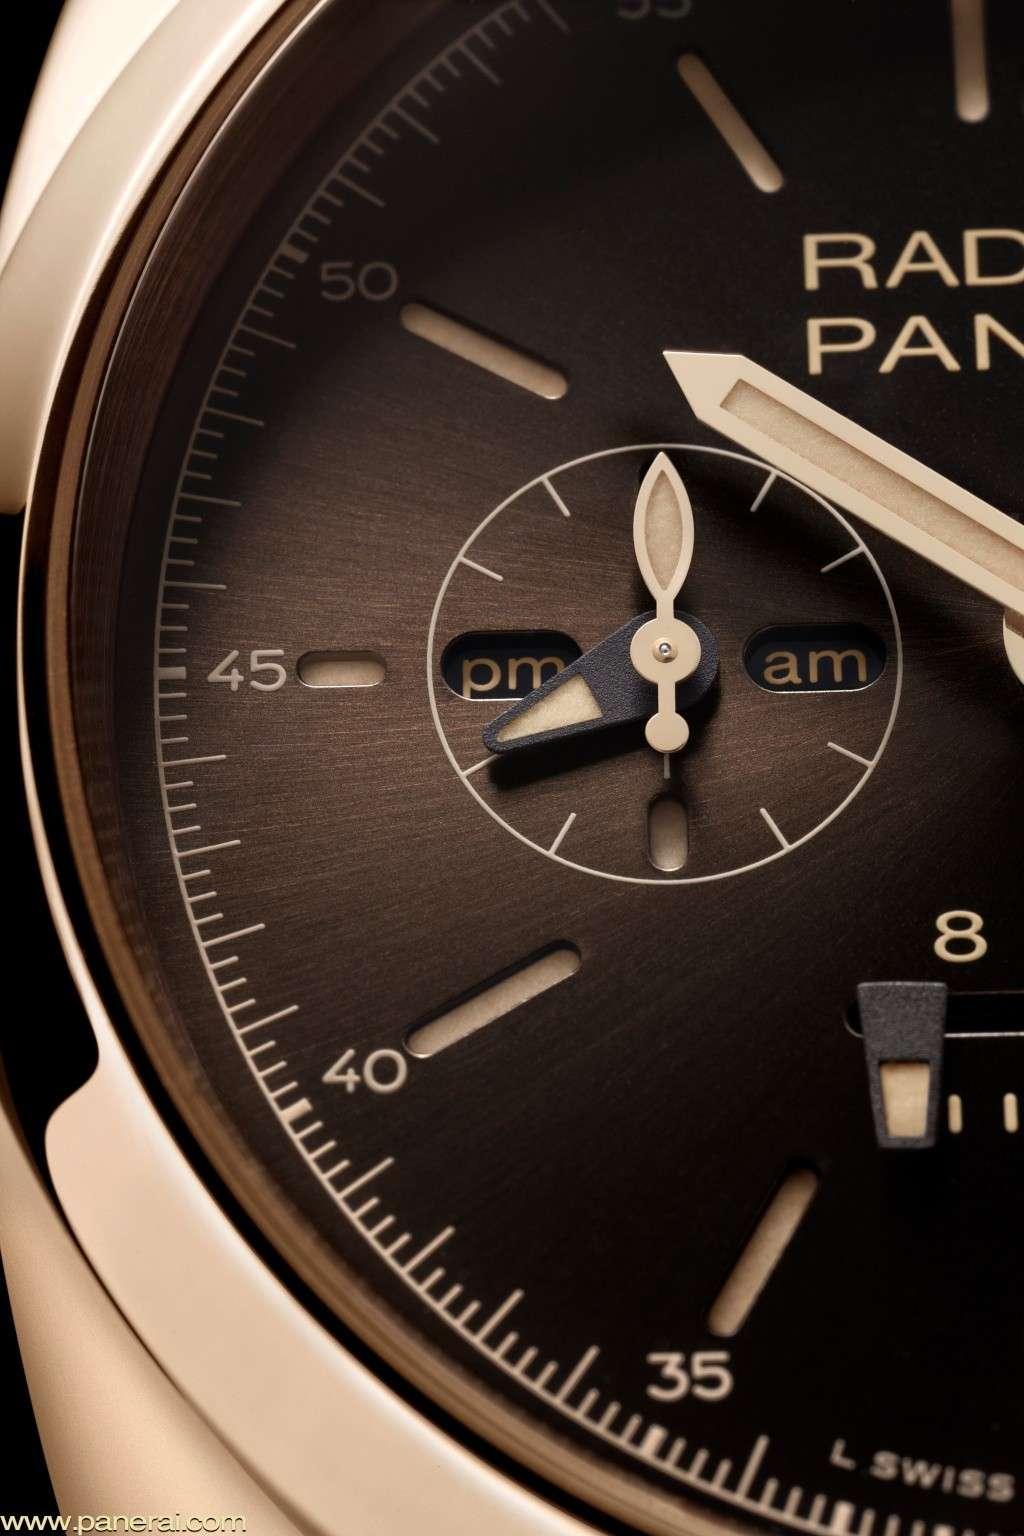 Communiqué de Presse : RADIOMIR 1940 CHRONO MONOPULSANTE 8 DAYS GMT ORO ROSSO – 45mm - PAM00502 Pam50214